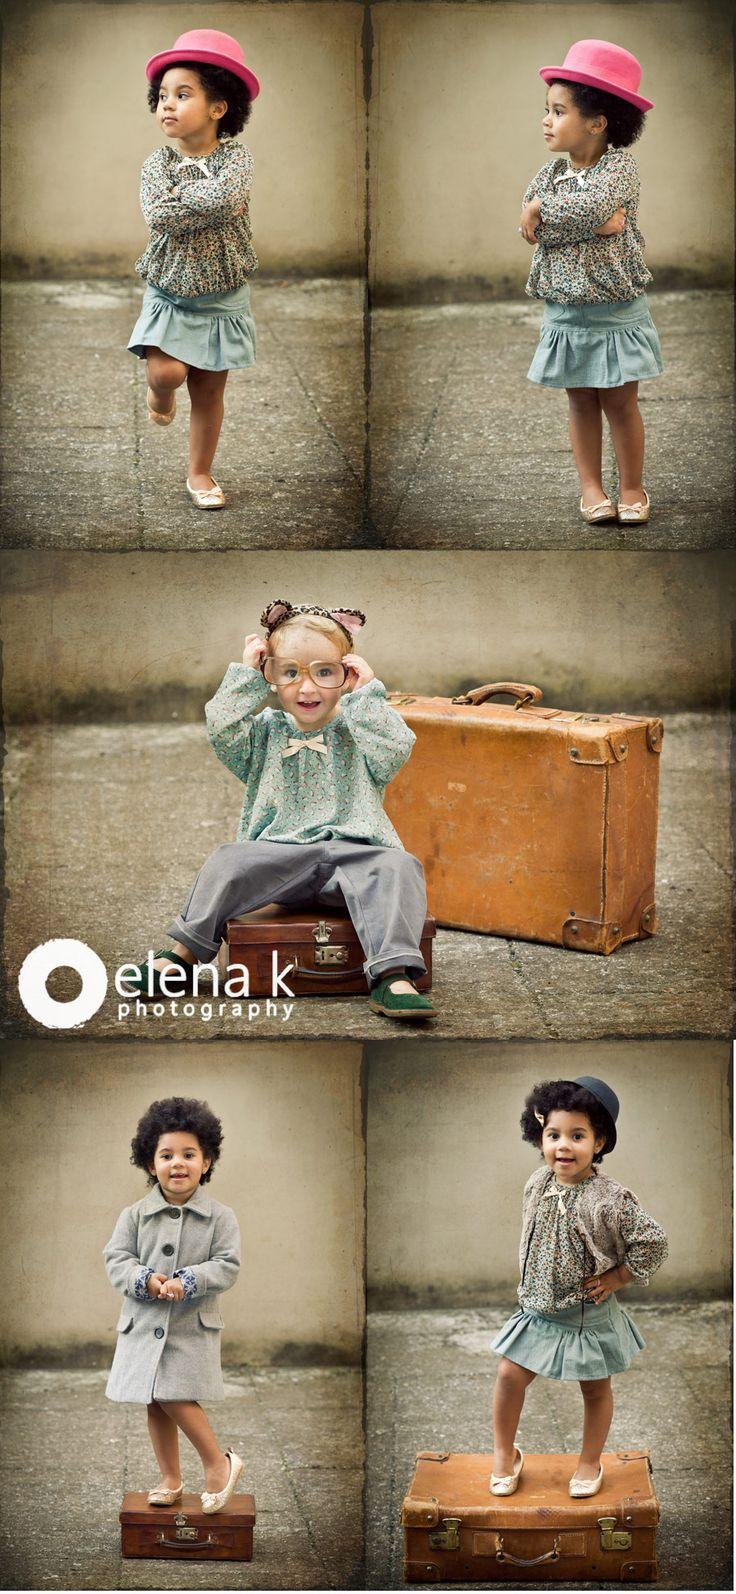 commercial child photography - elena k photography, Milano - Italy